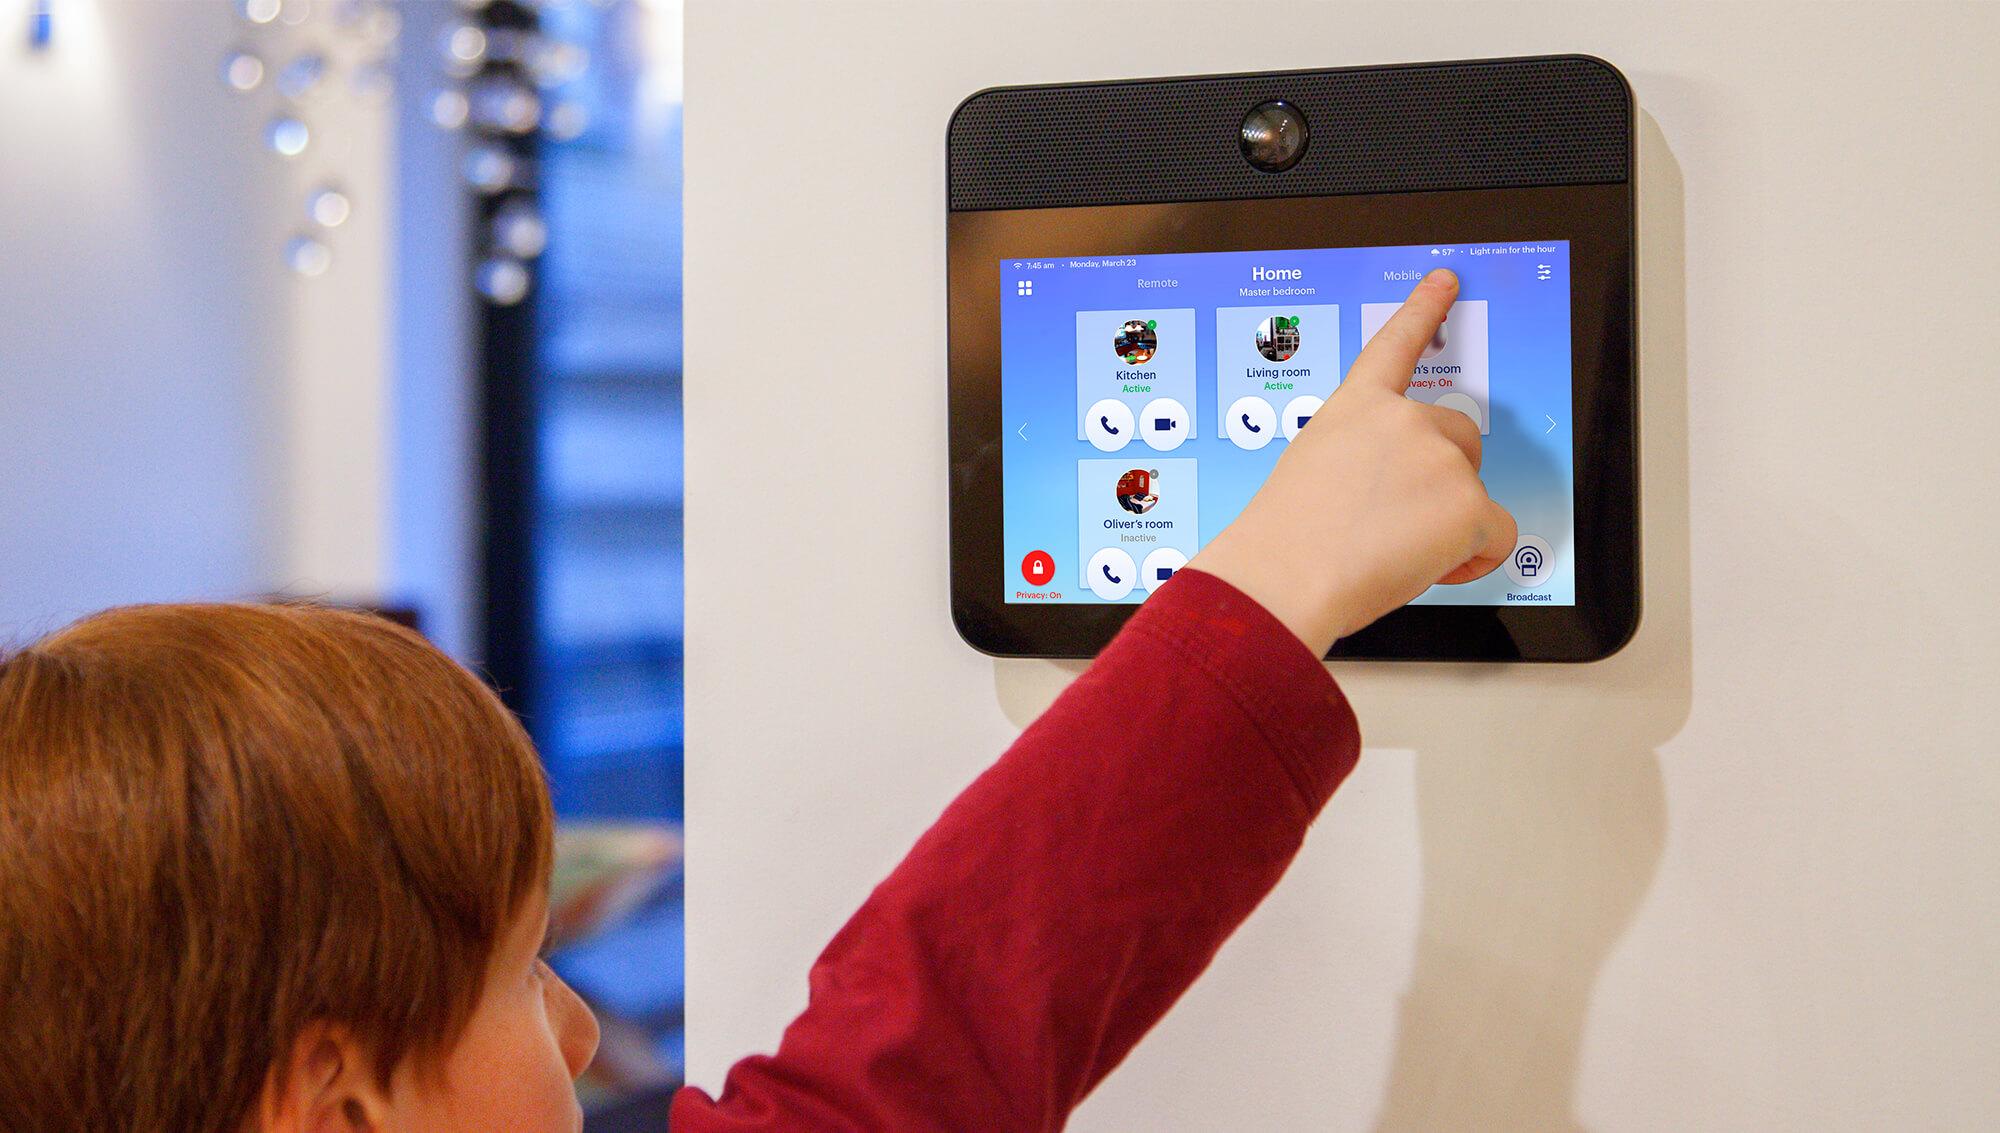 Nucleus A Modern Smart Home Wireless Intercom System That